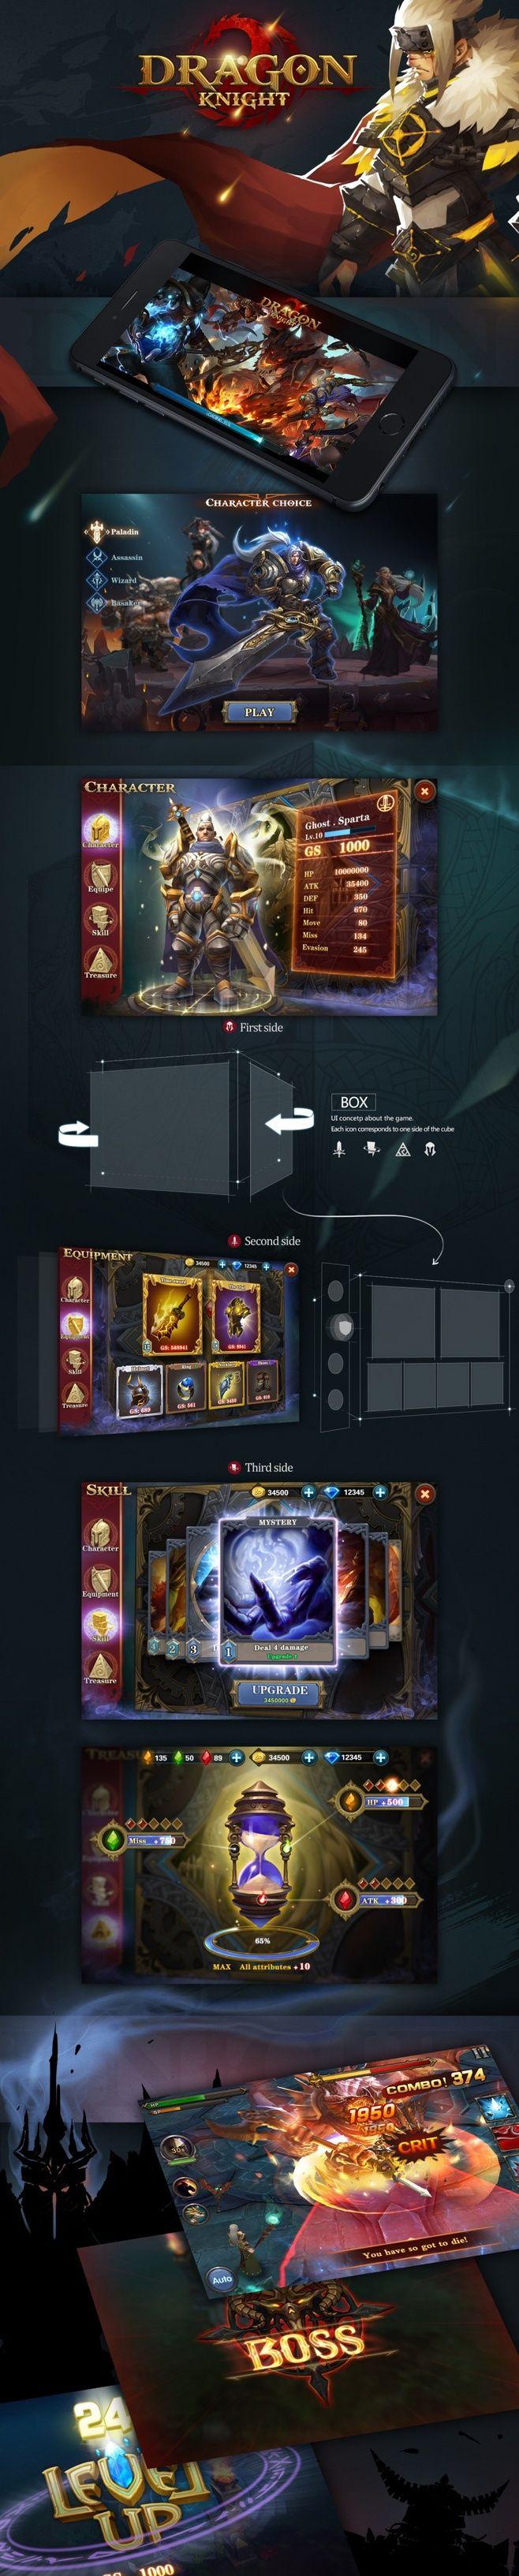 Dragon knight | Games UI | G ...